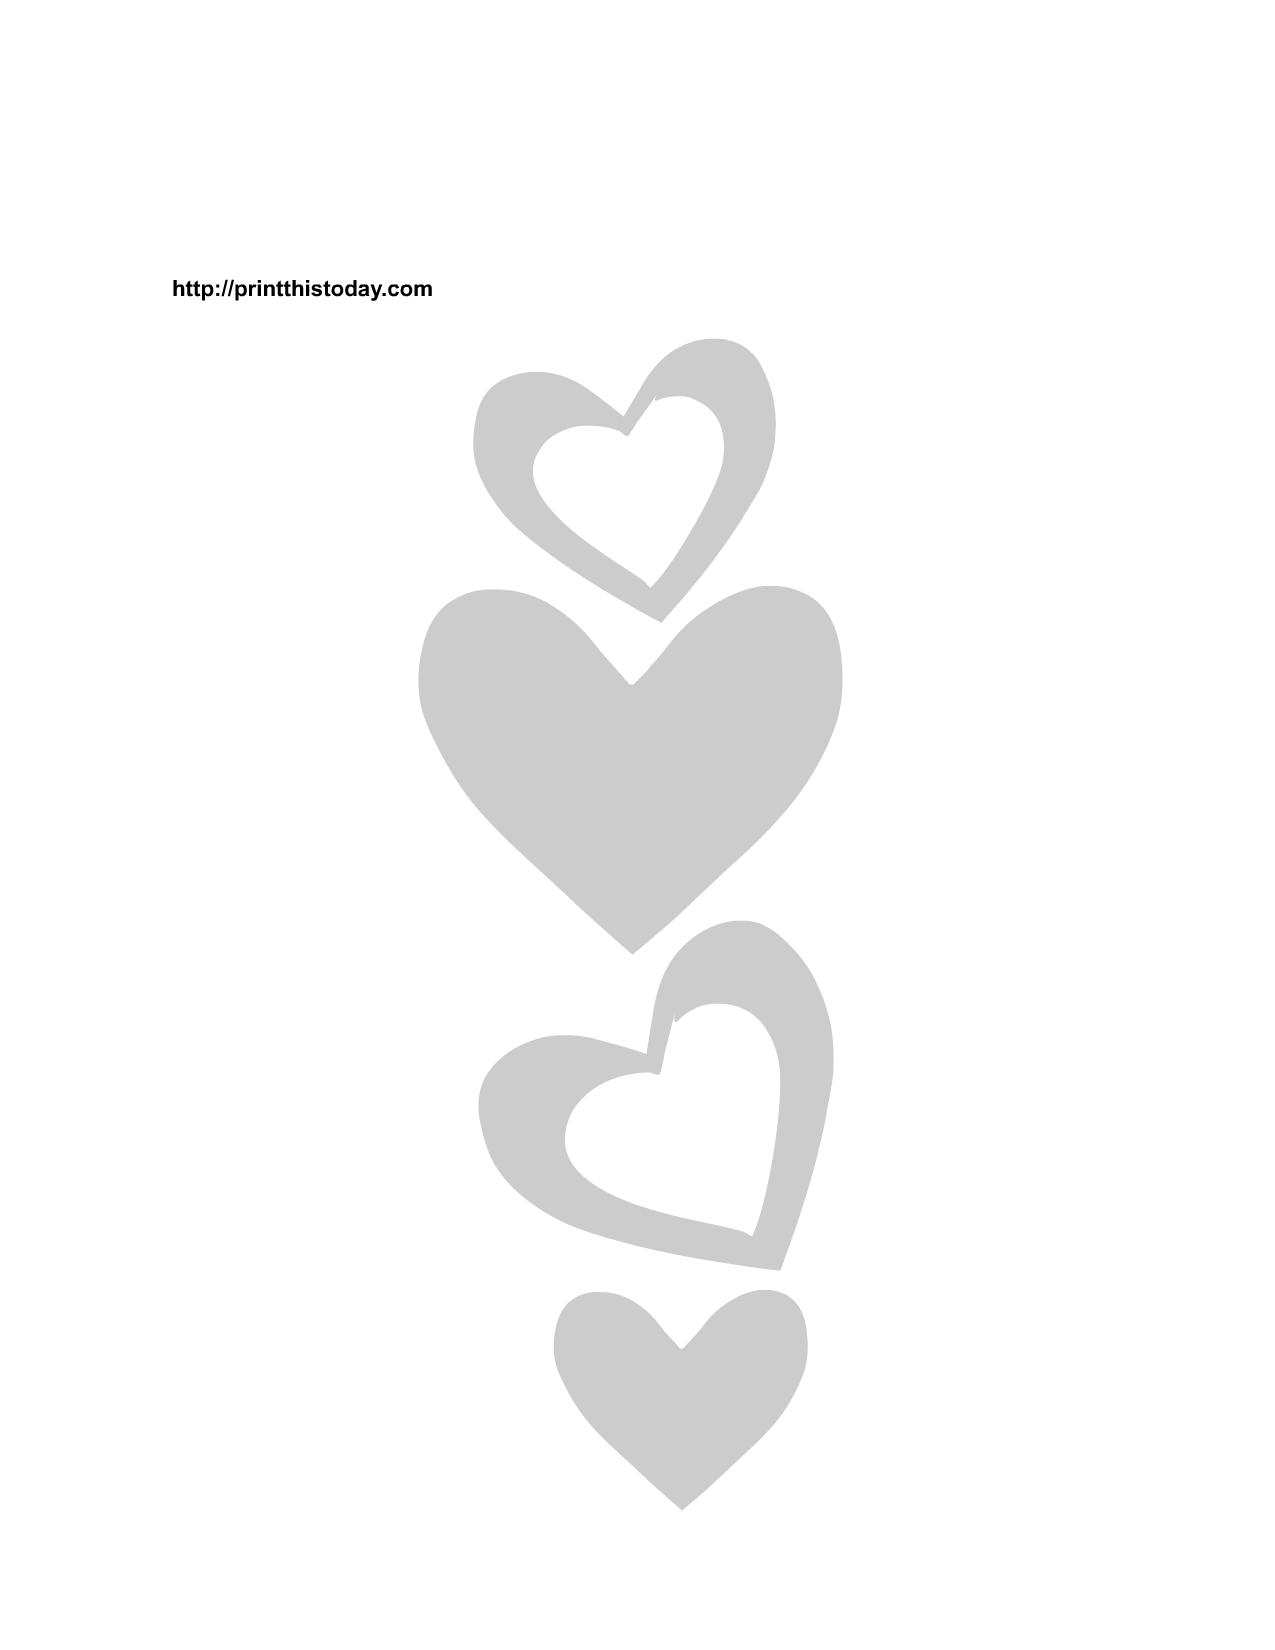 Free Heart Printable Border Stencils